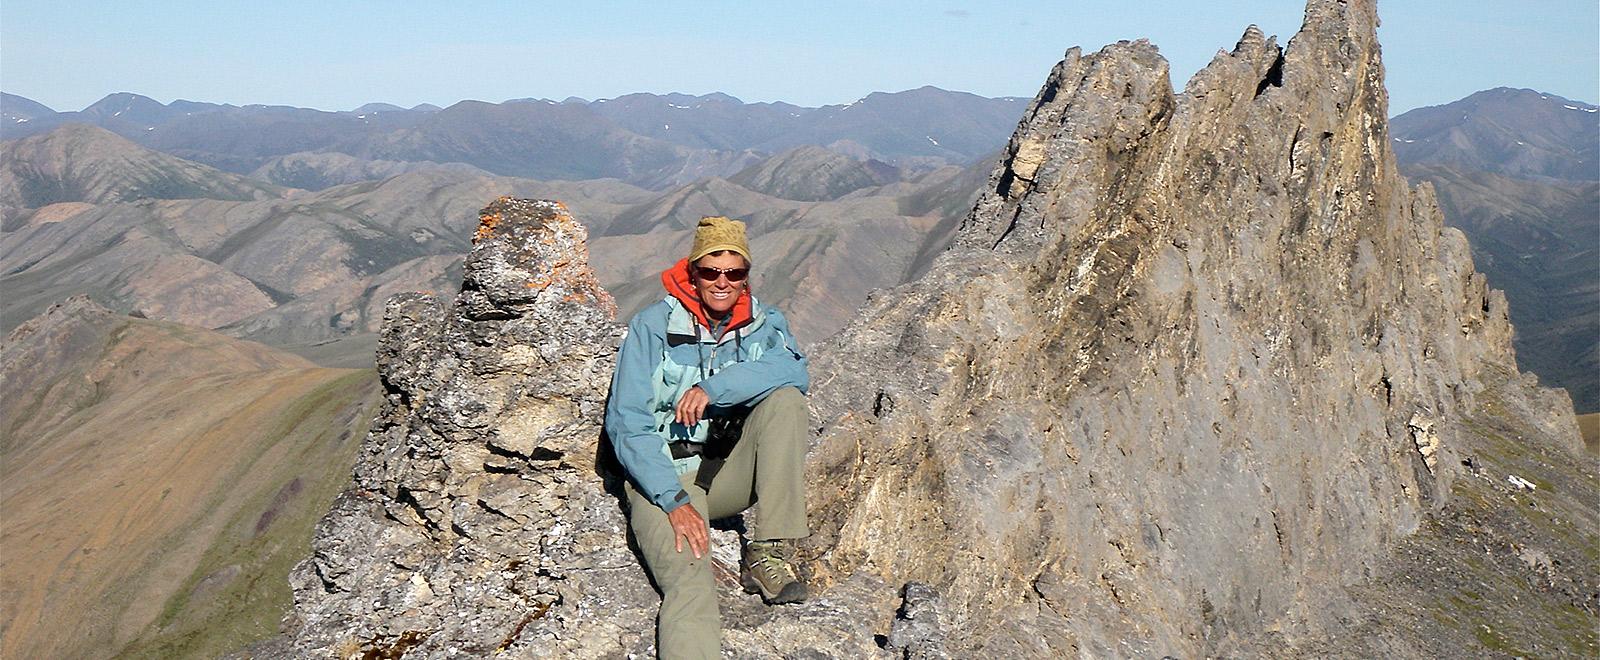 hiking trip